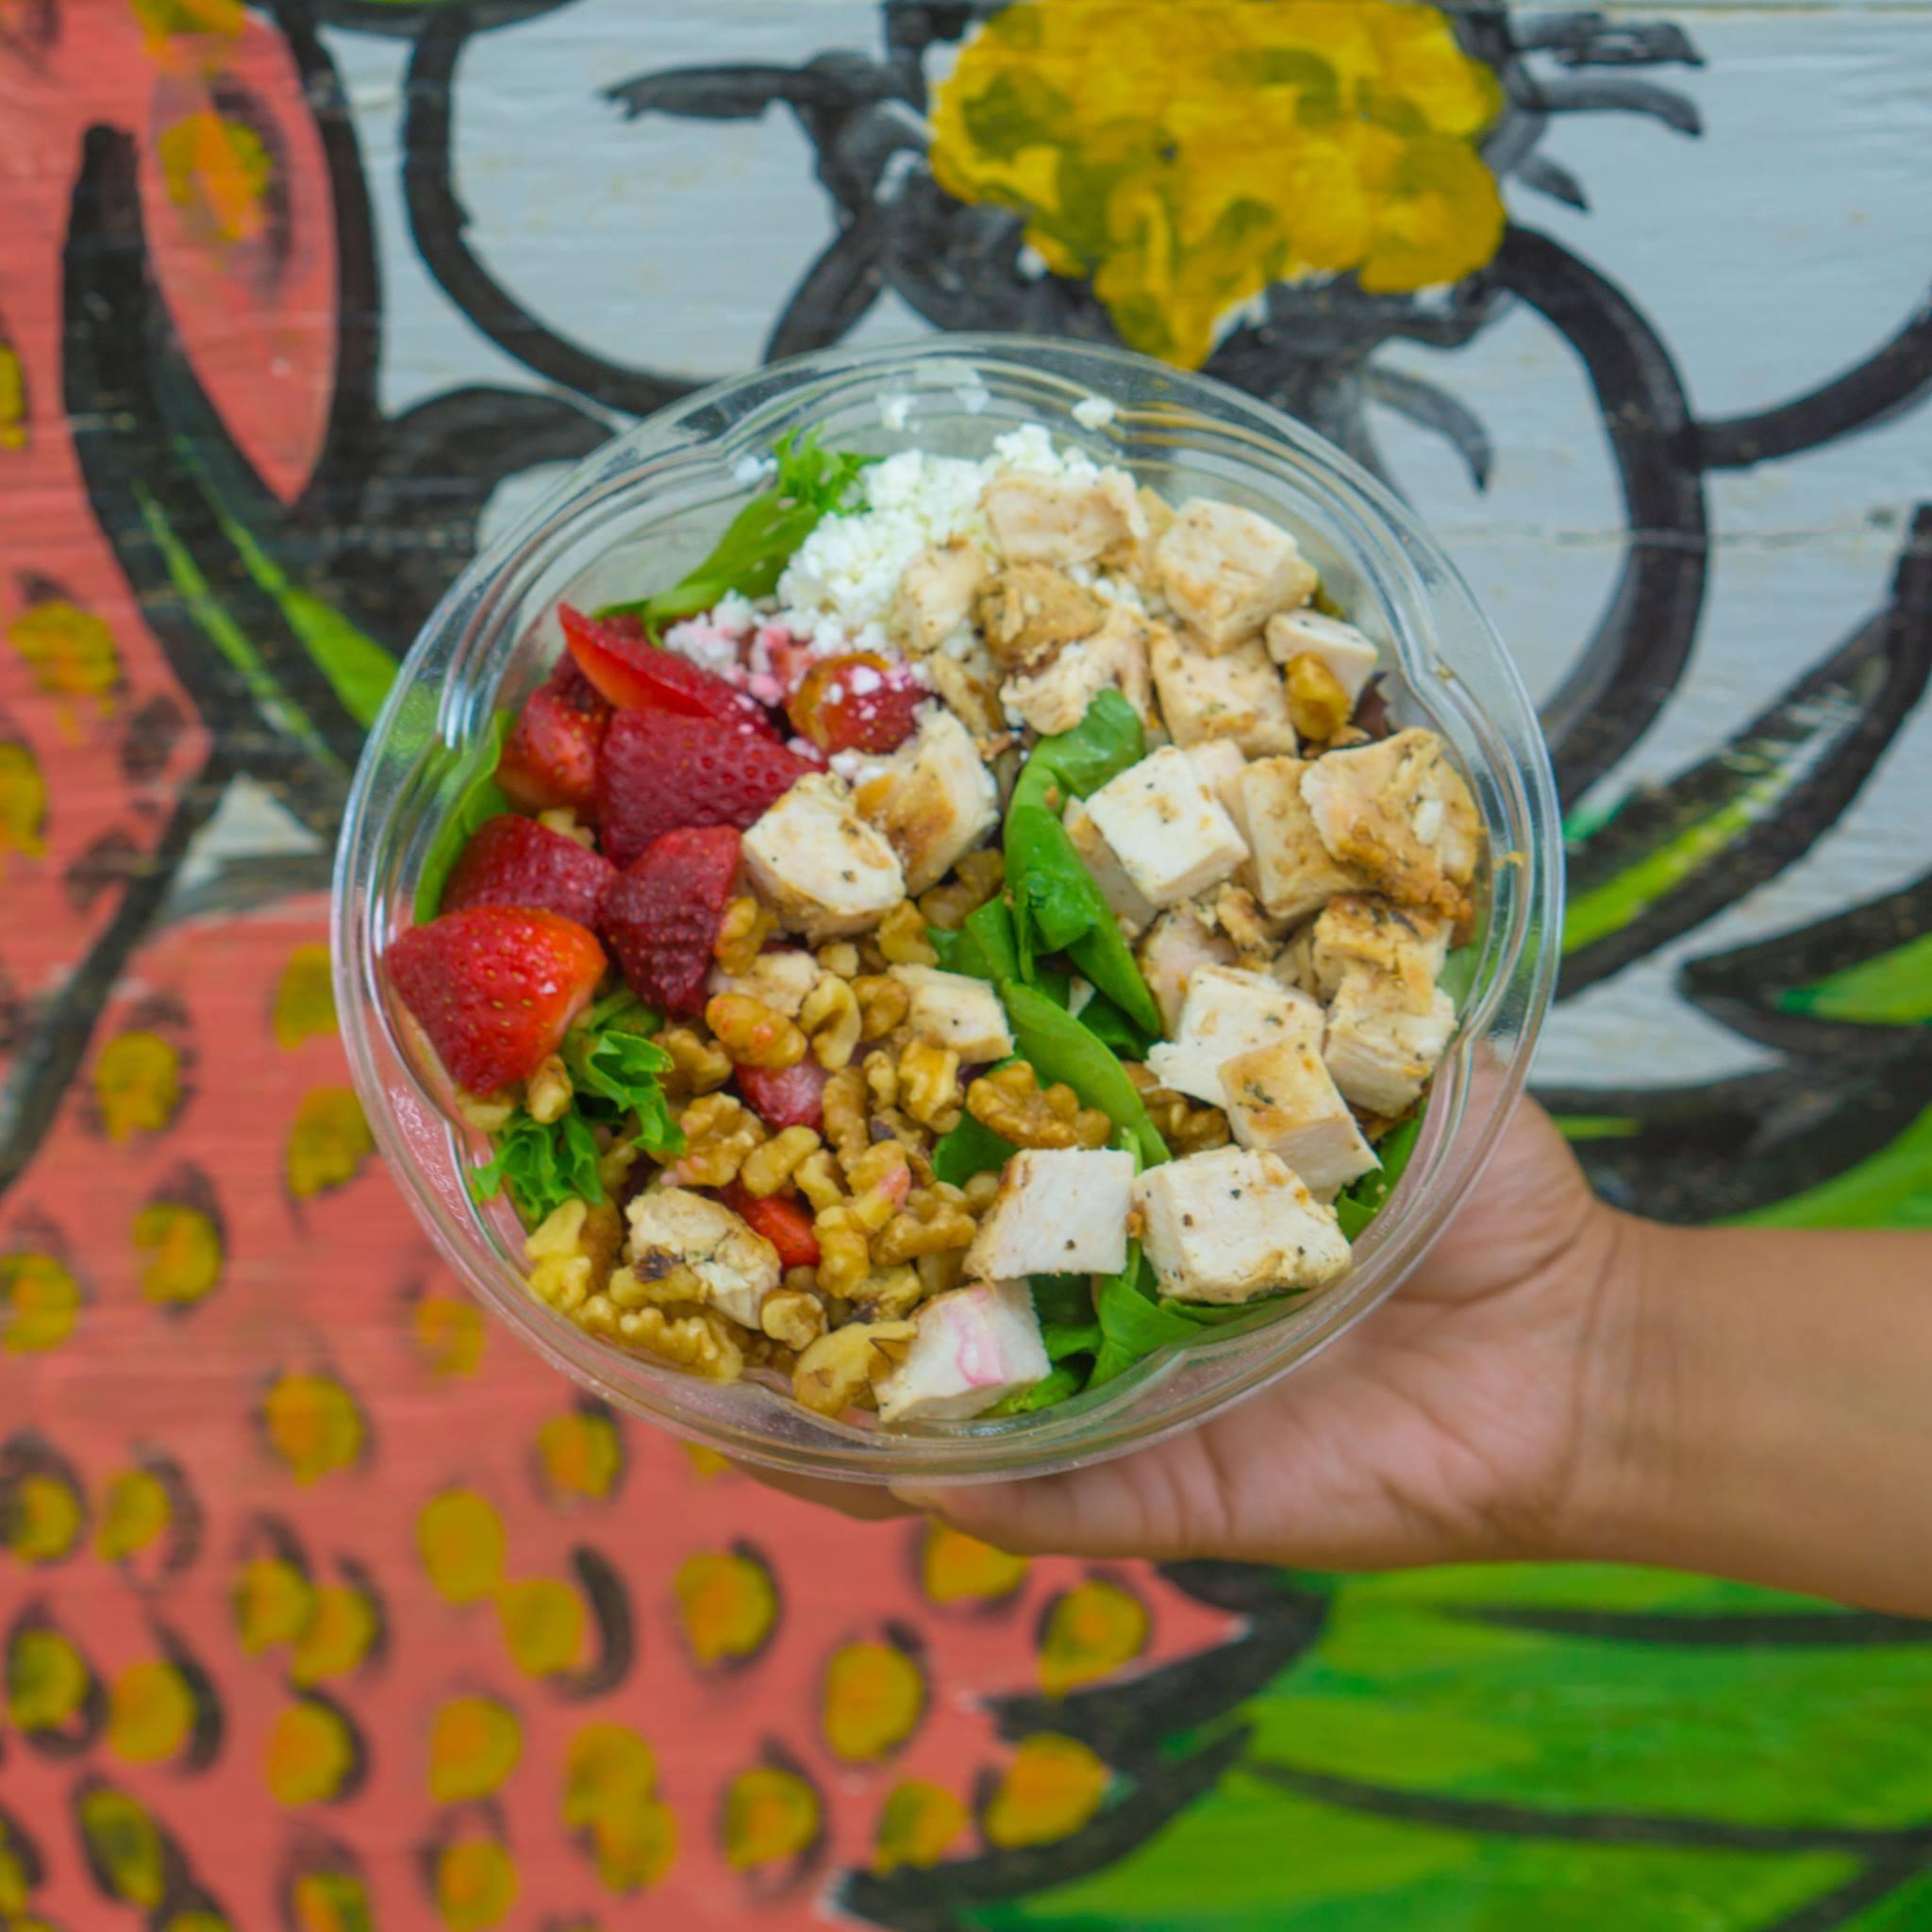 Salad from Bread Zeppelin